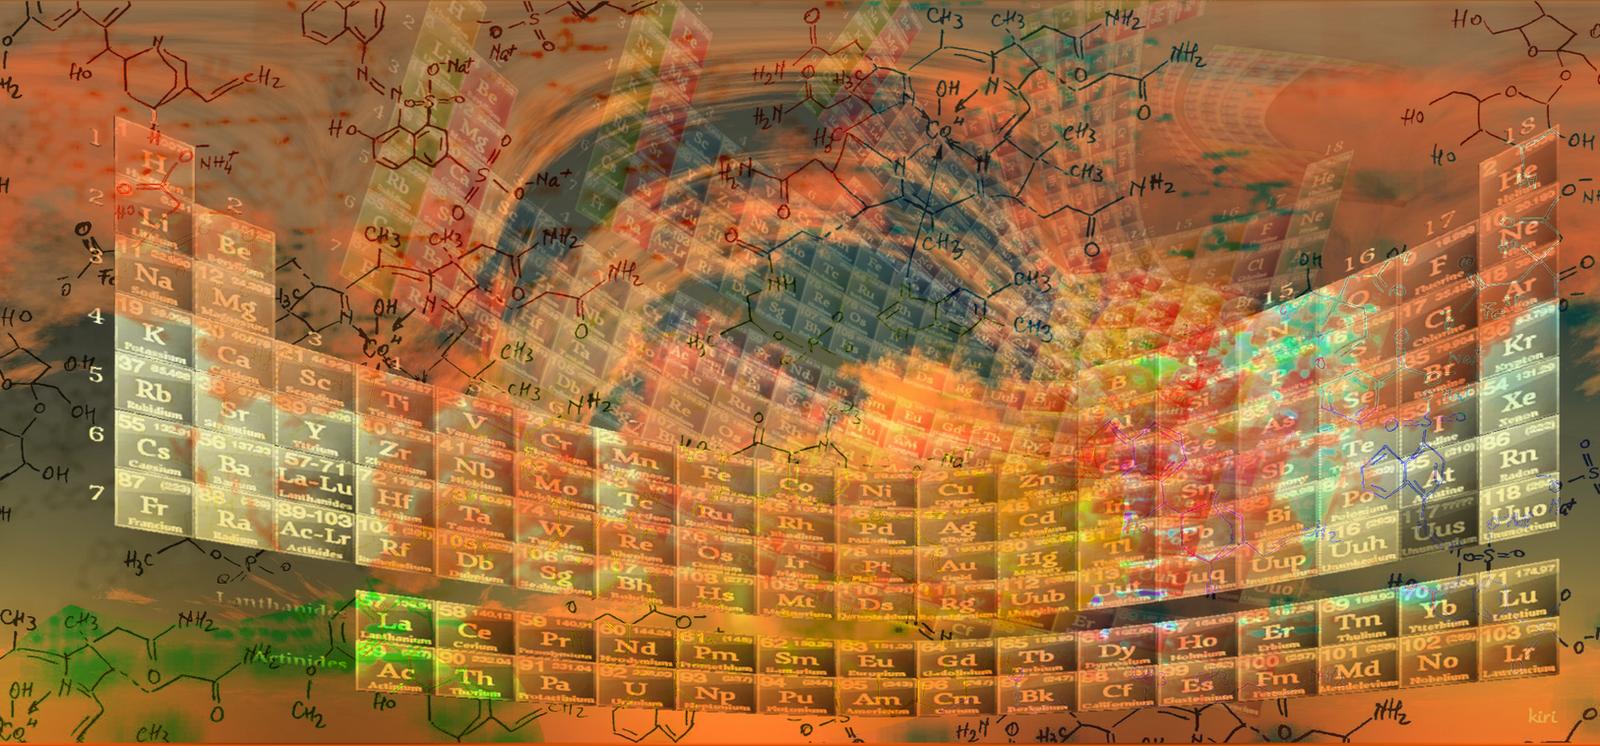 Wallpaper periodic table by kiri mun on deviantart wallpaper periodic table by kiri mun urtaz Gallery